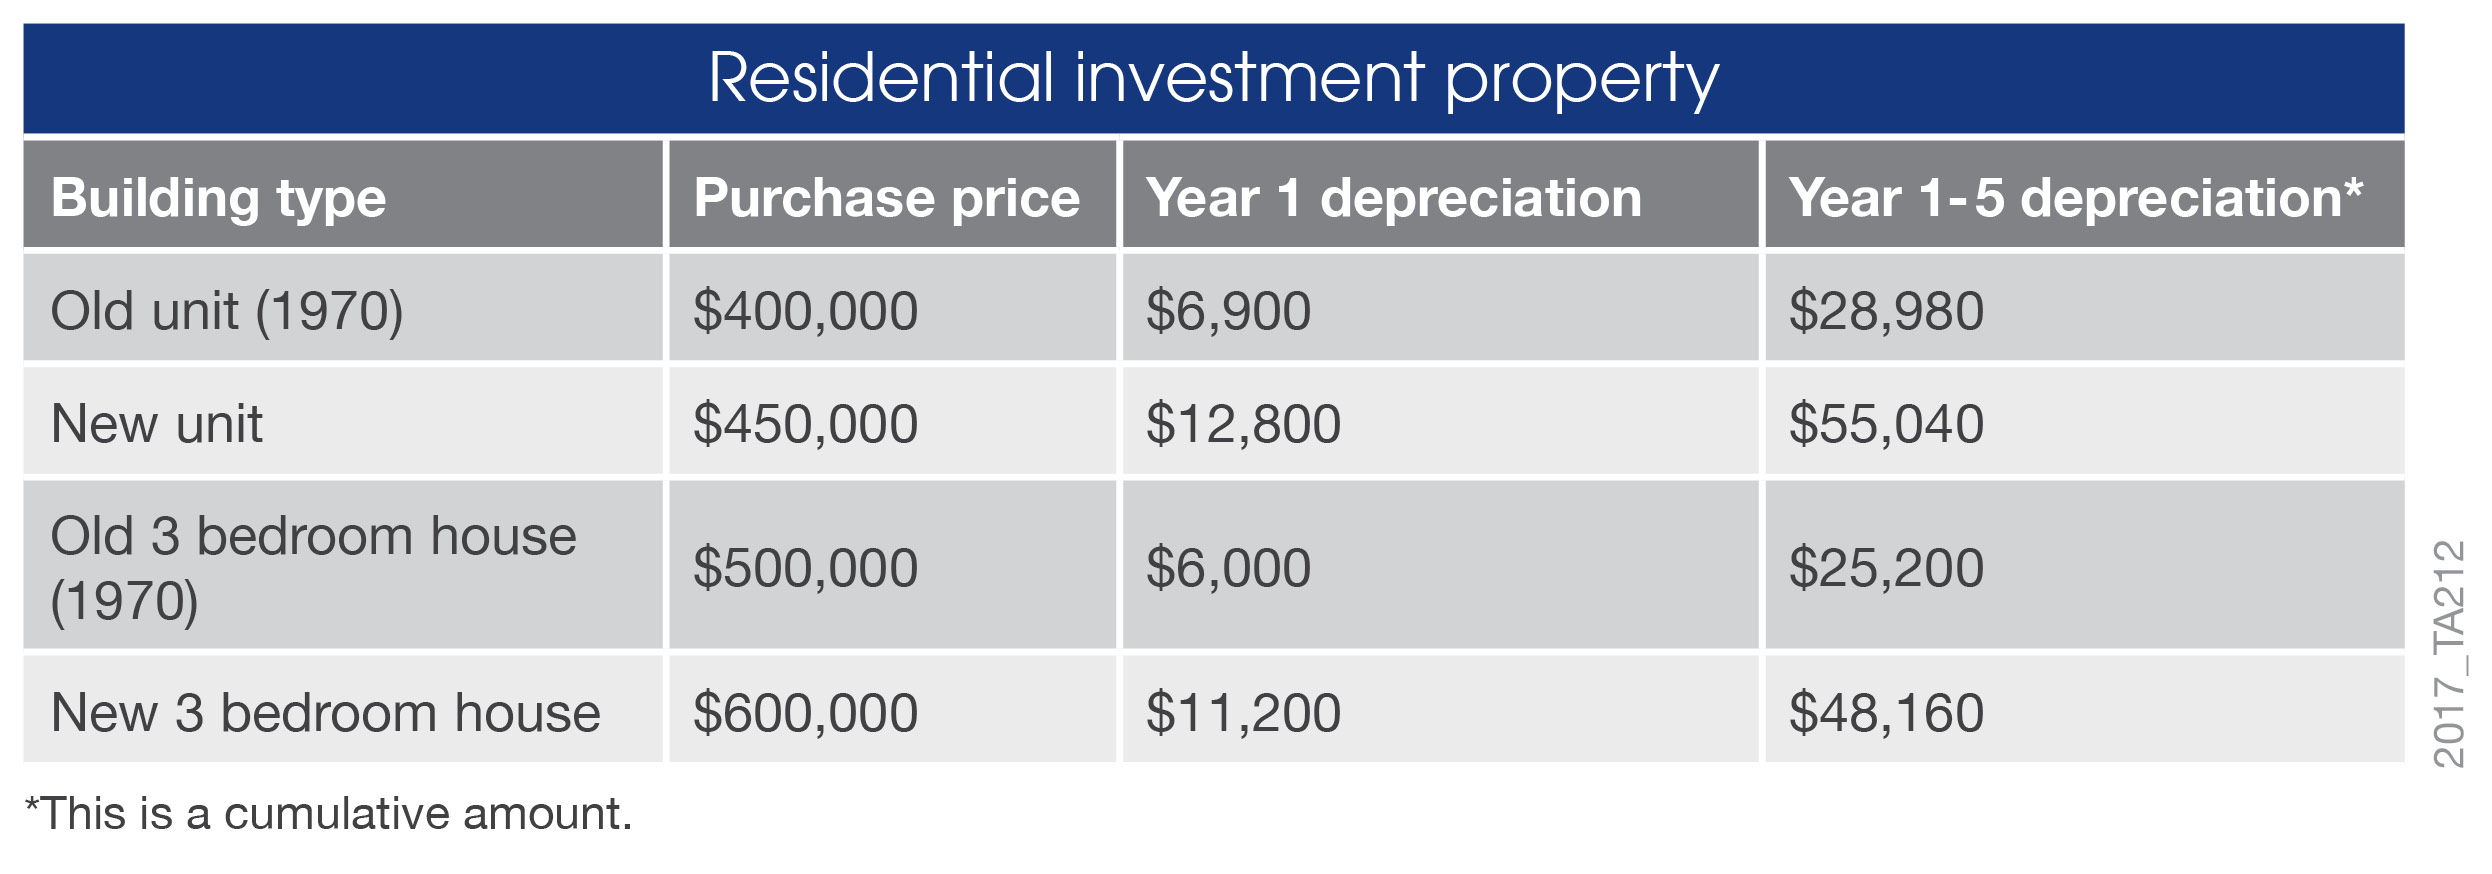 property depreciation richardson wrench